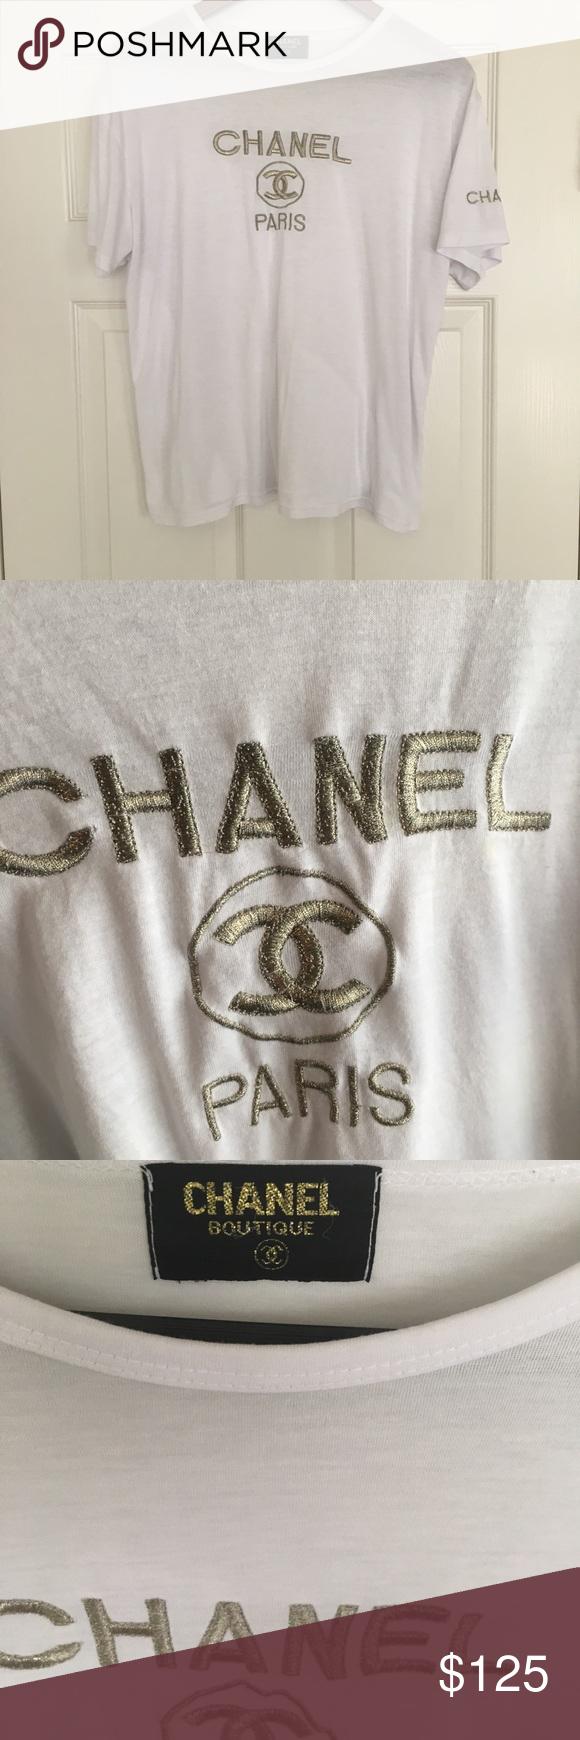 CHANEL Authentic CC White Vintage TShirt Vintage